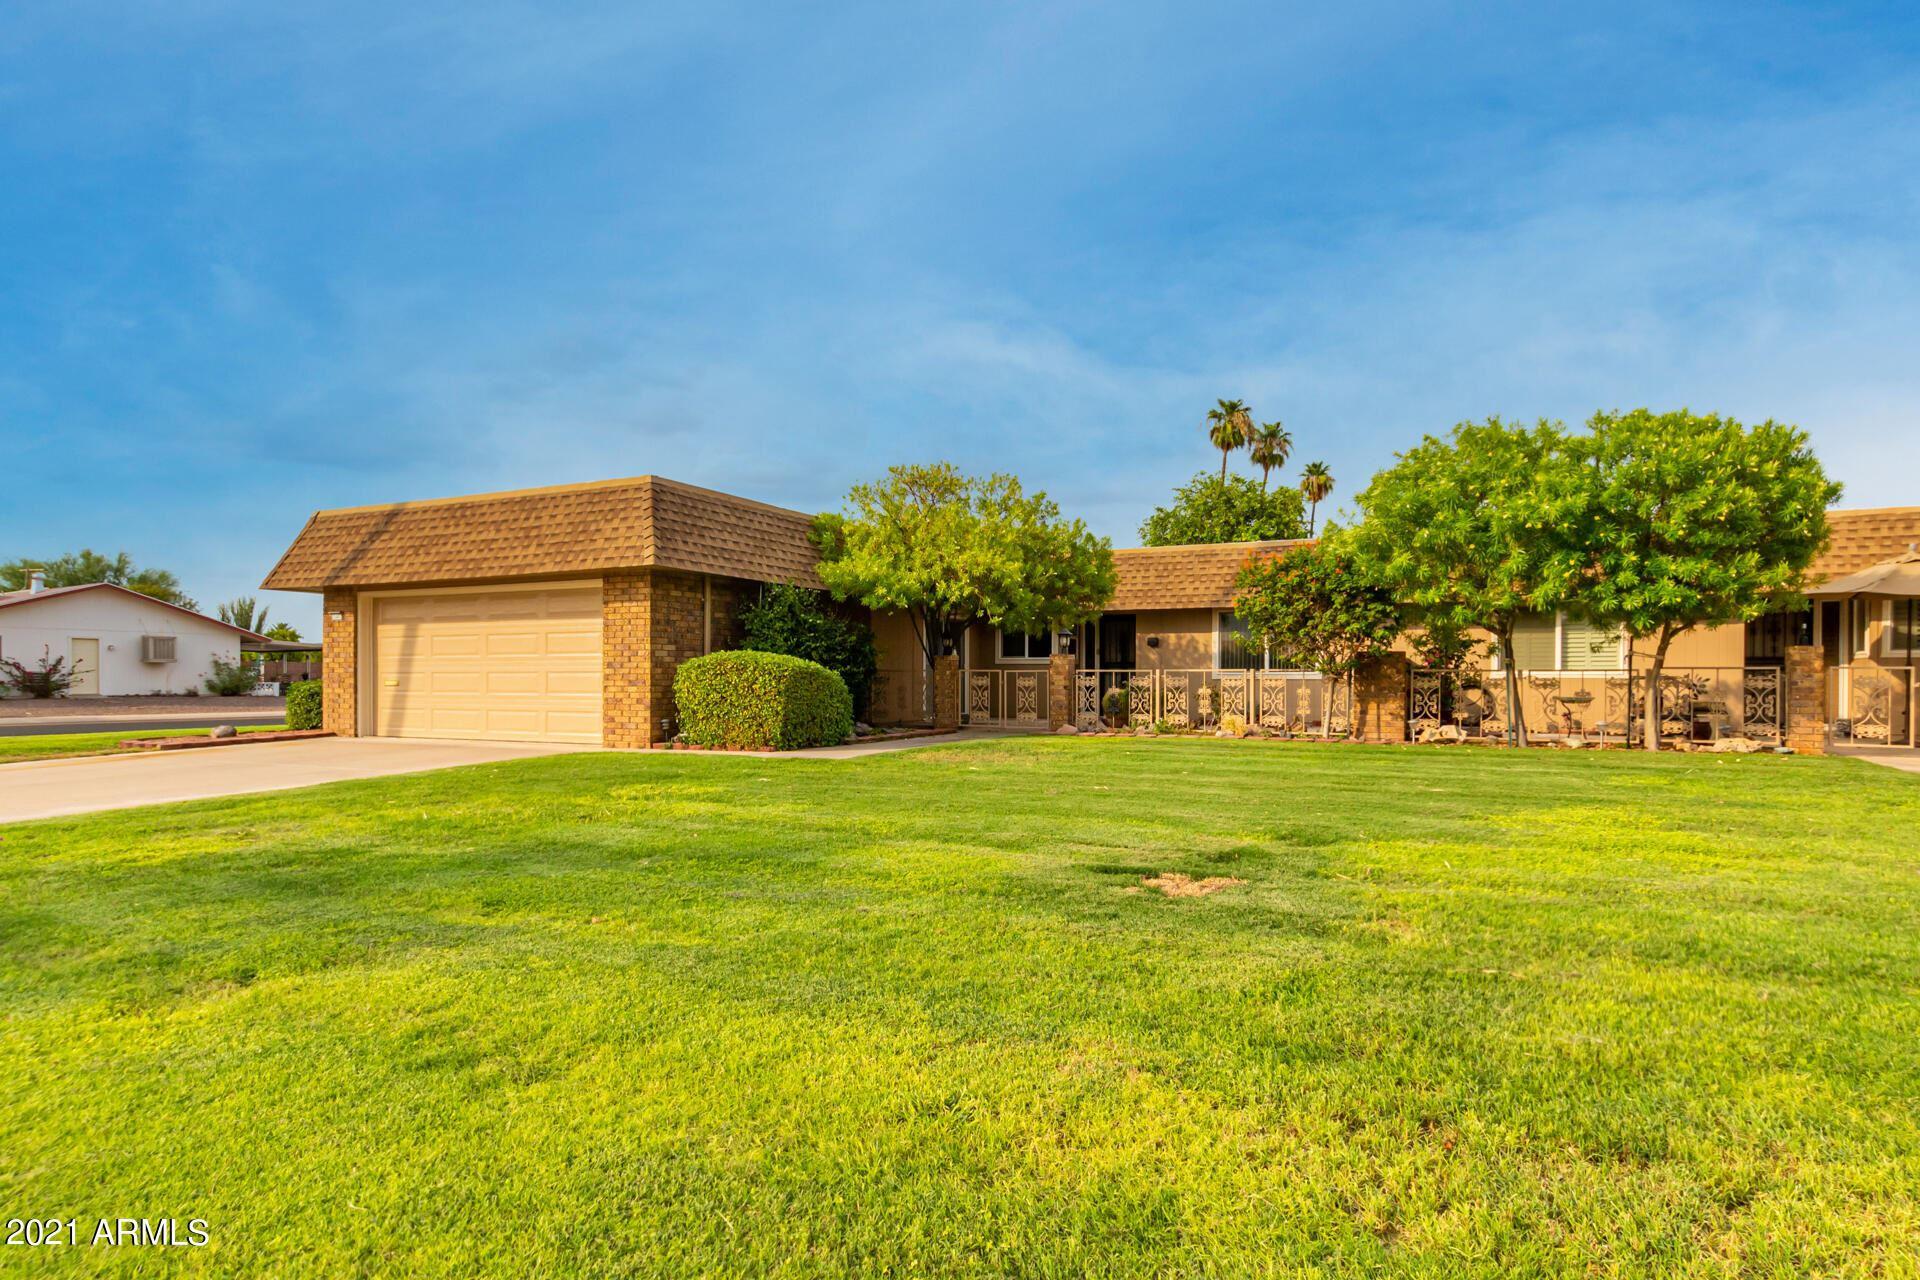 Photo of 15407 N BOSWELL Boulevard, Sun City, AZ 85351 (MLS # 6268898)